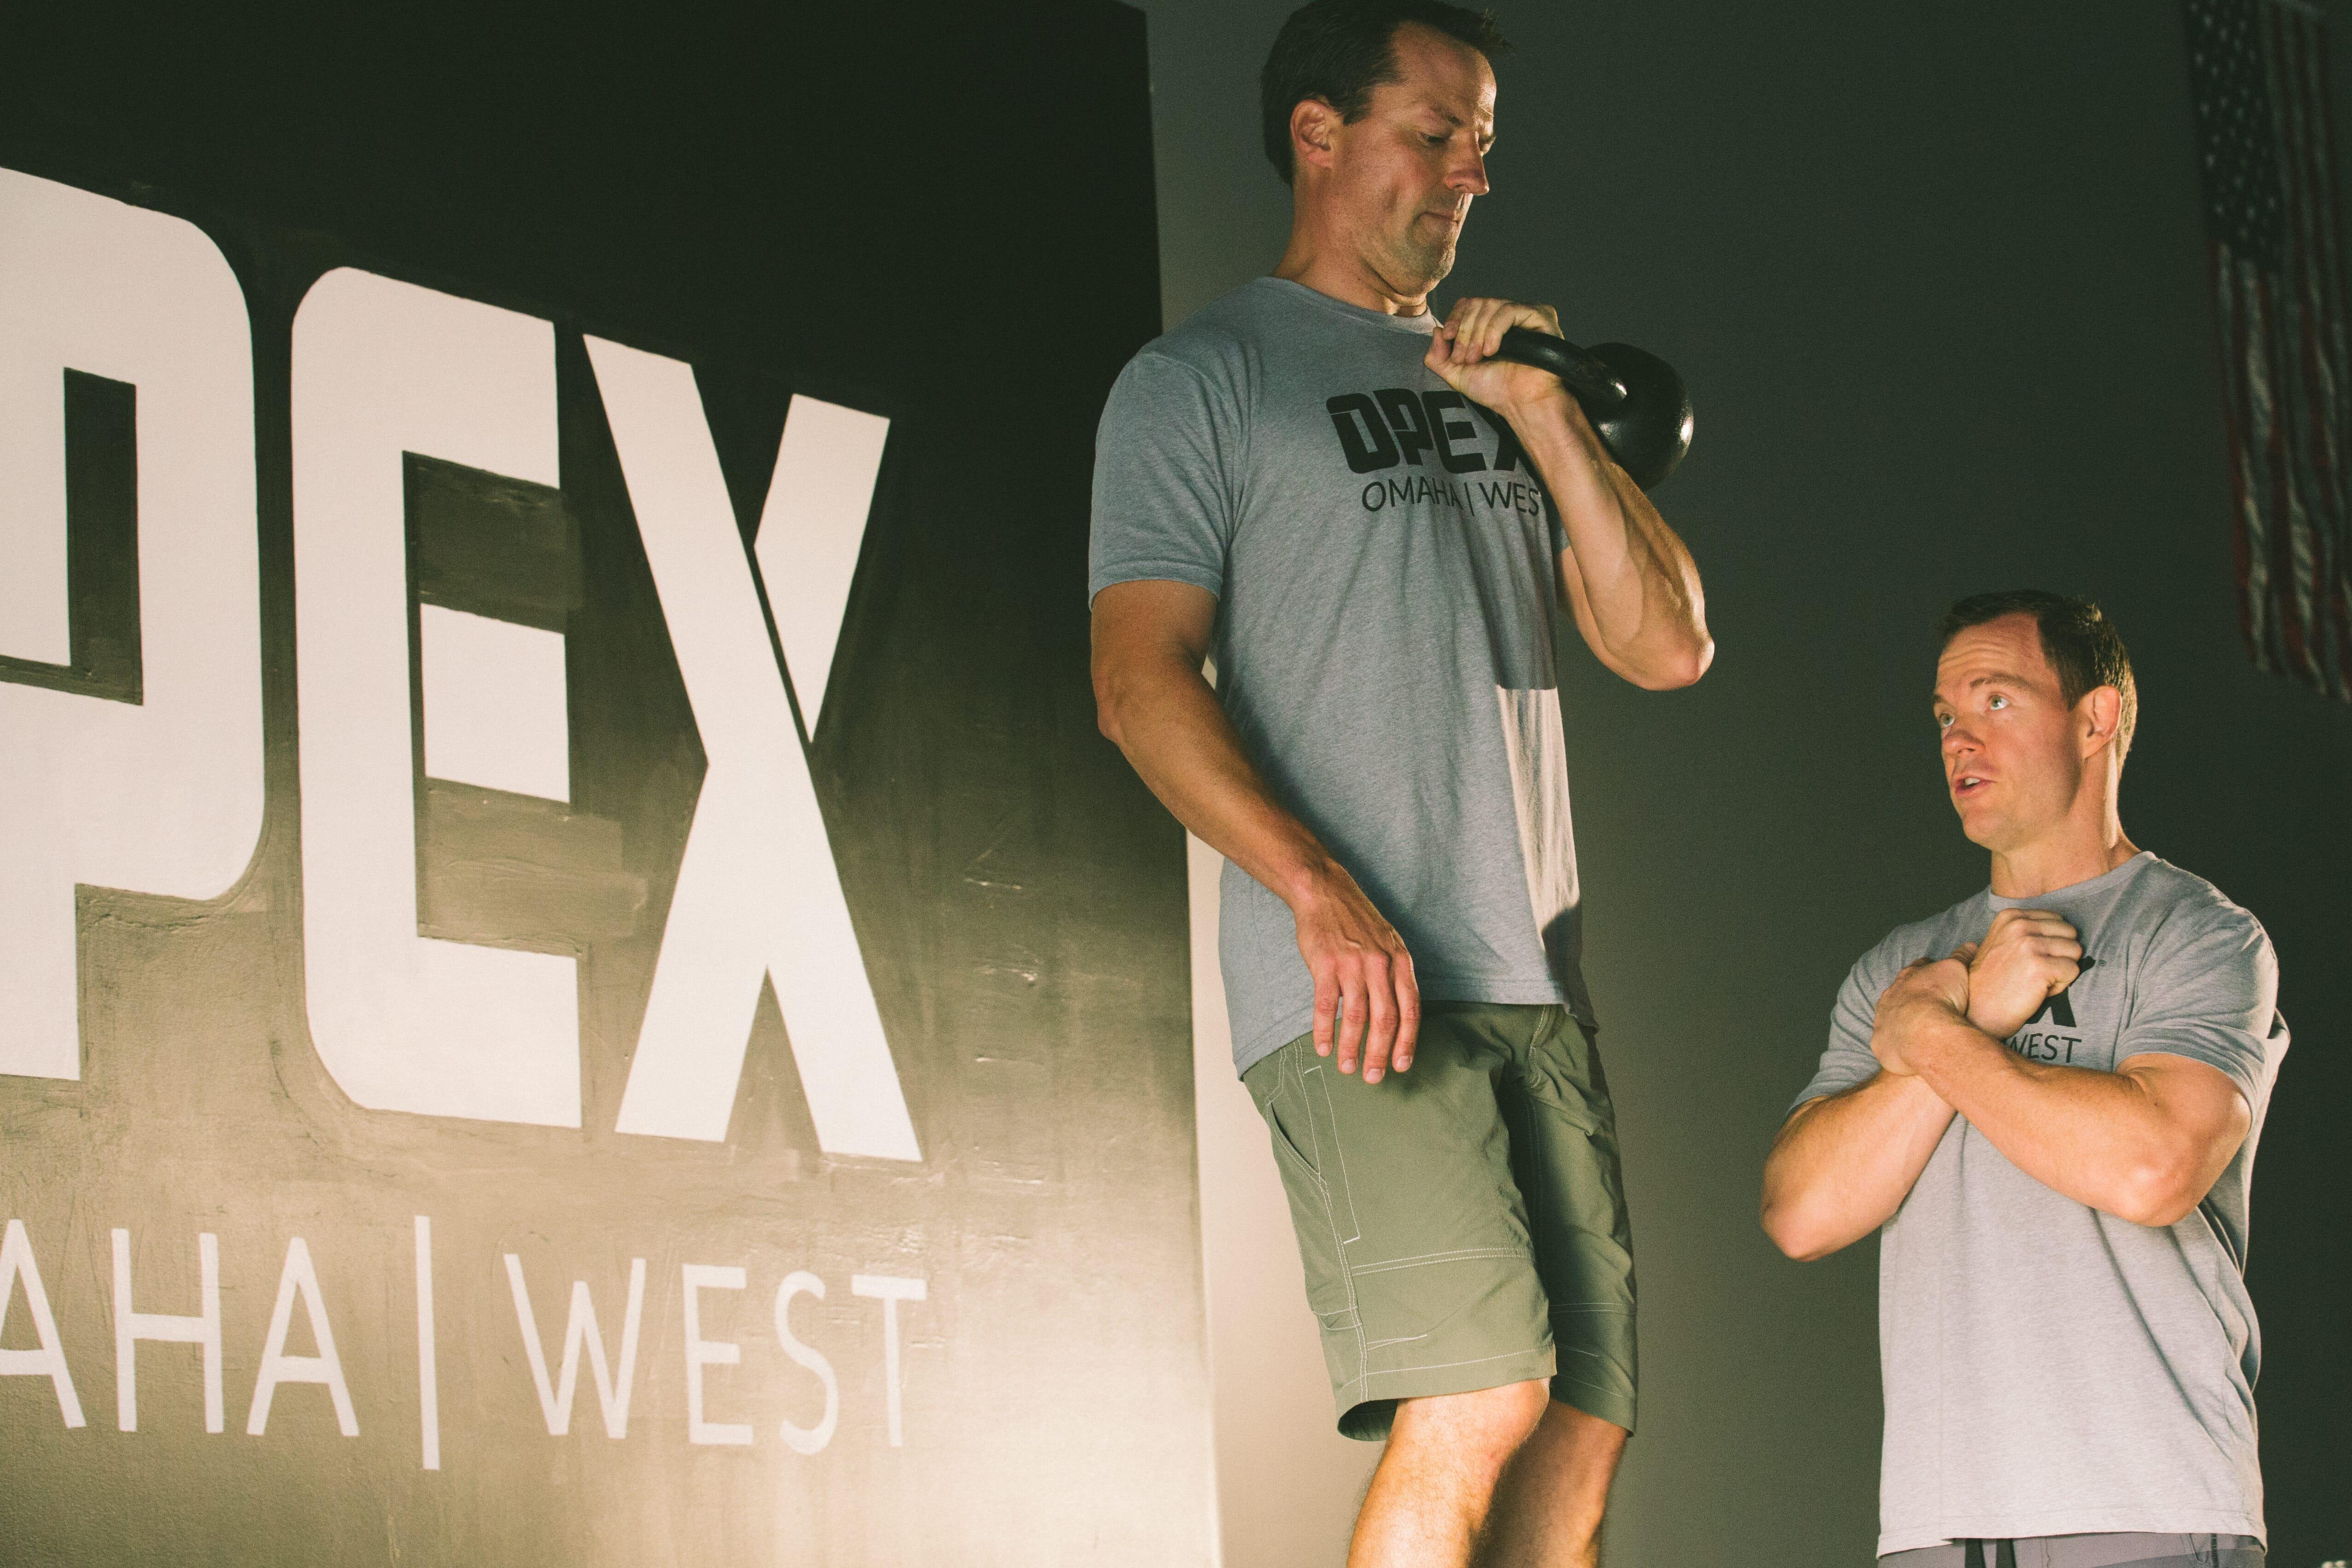 OPEX Omaha West Newsletter